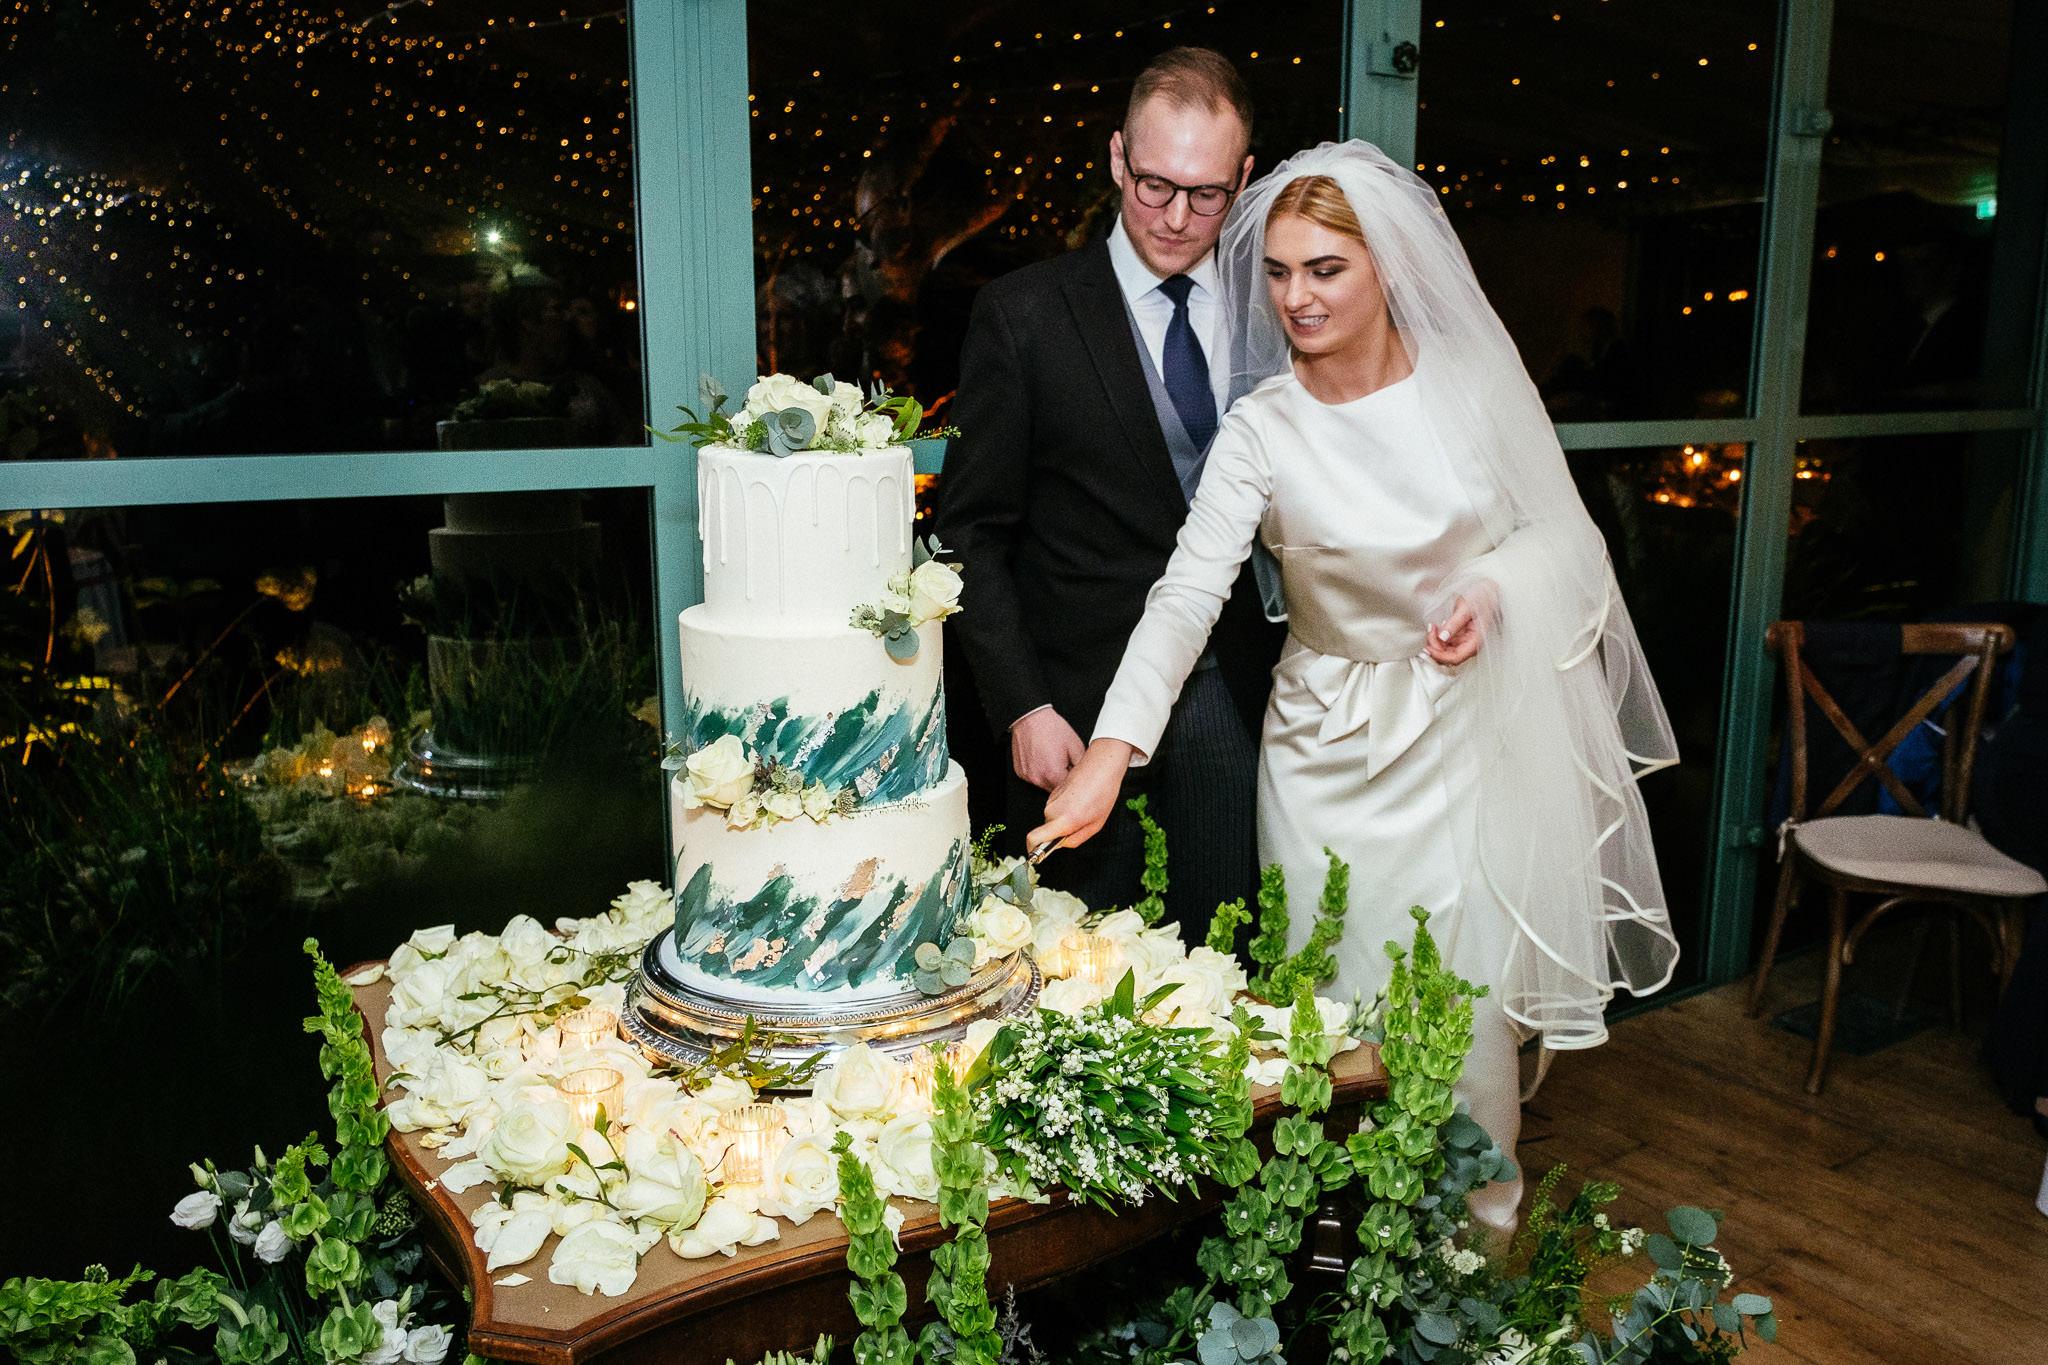 bride and groom cutting cake at Virginia Park Lodge wedding